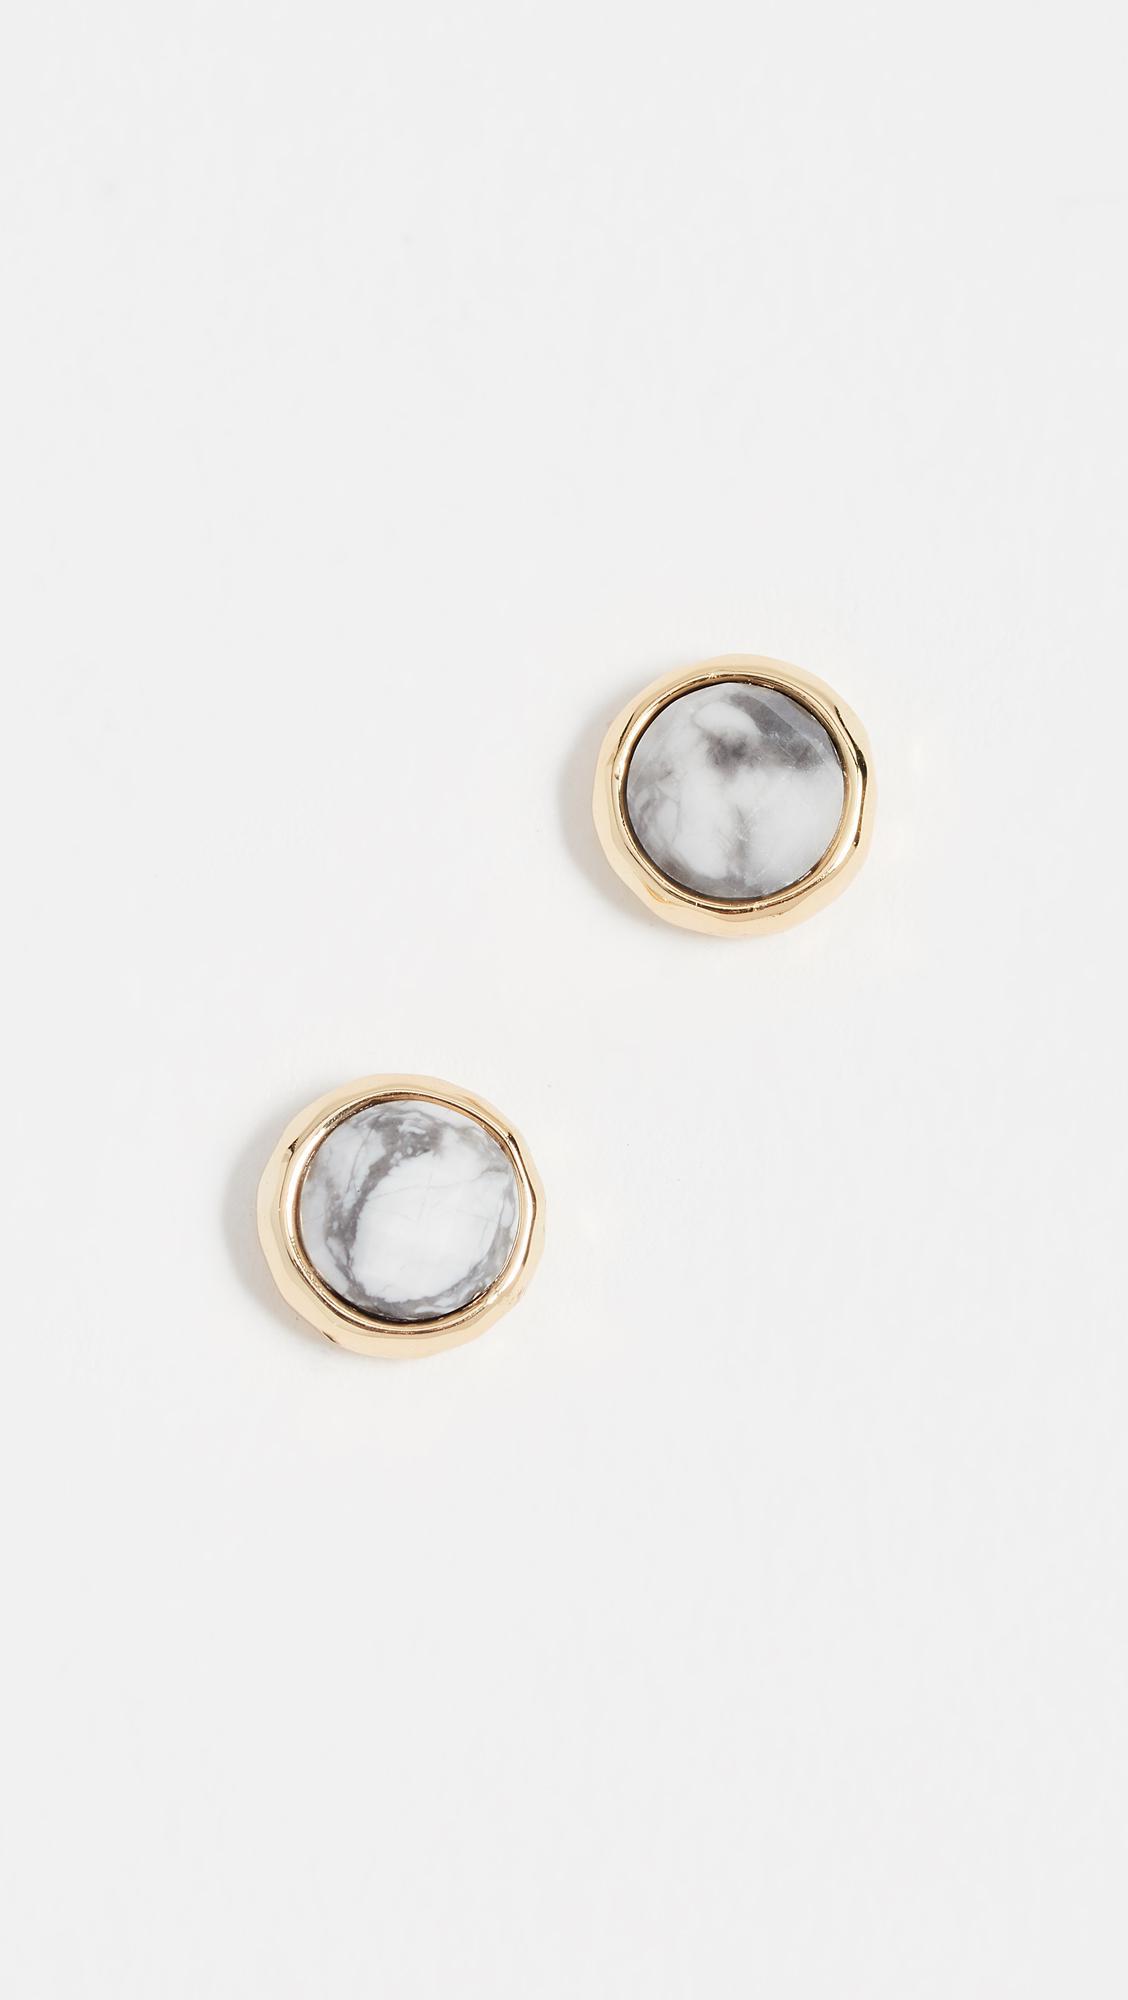 Gorjana Power Gemstone Stud Earrings U6UdZZxk